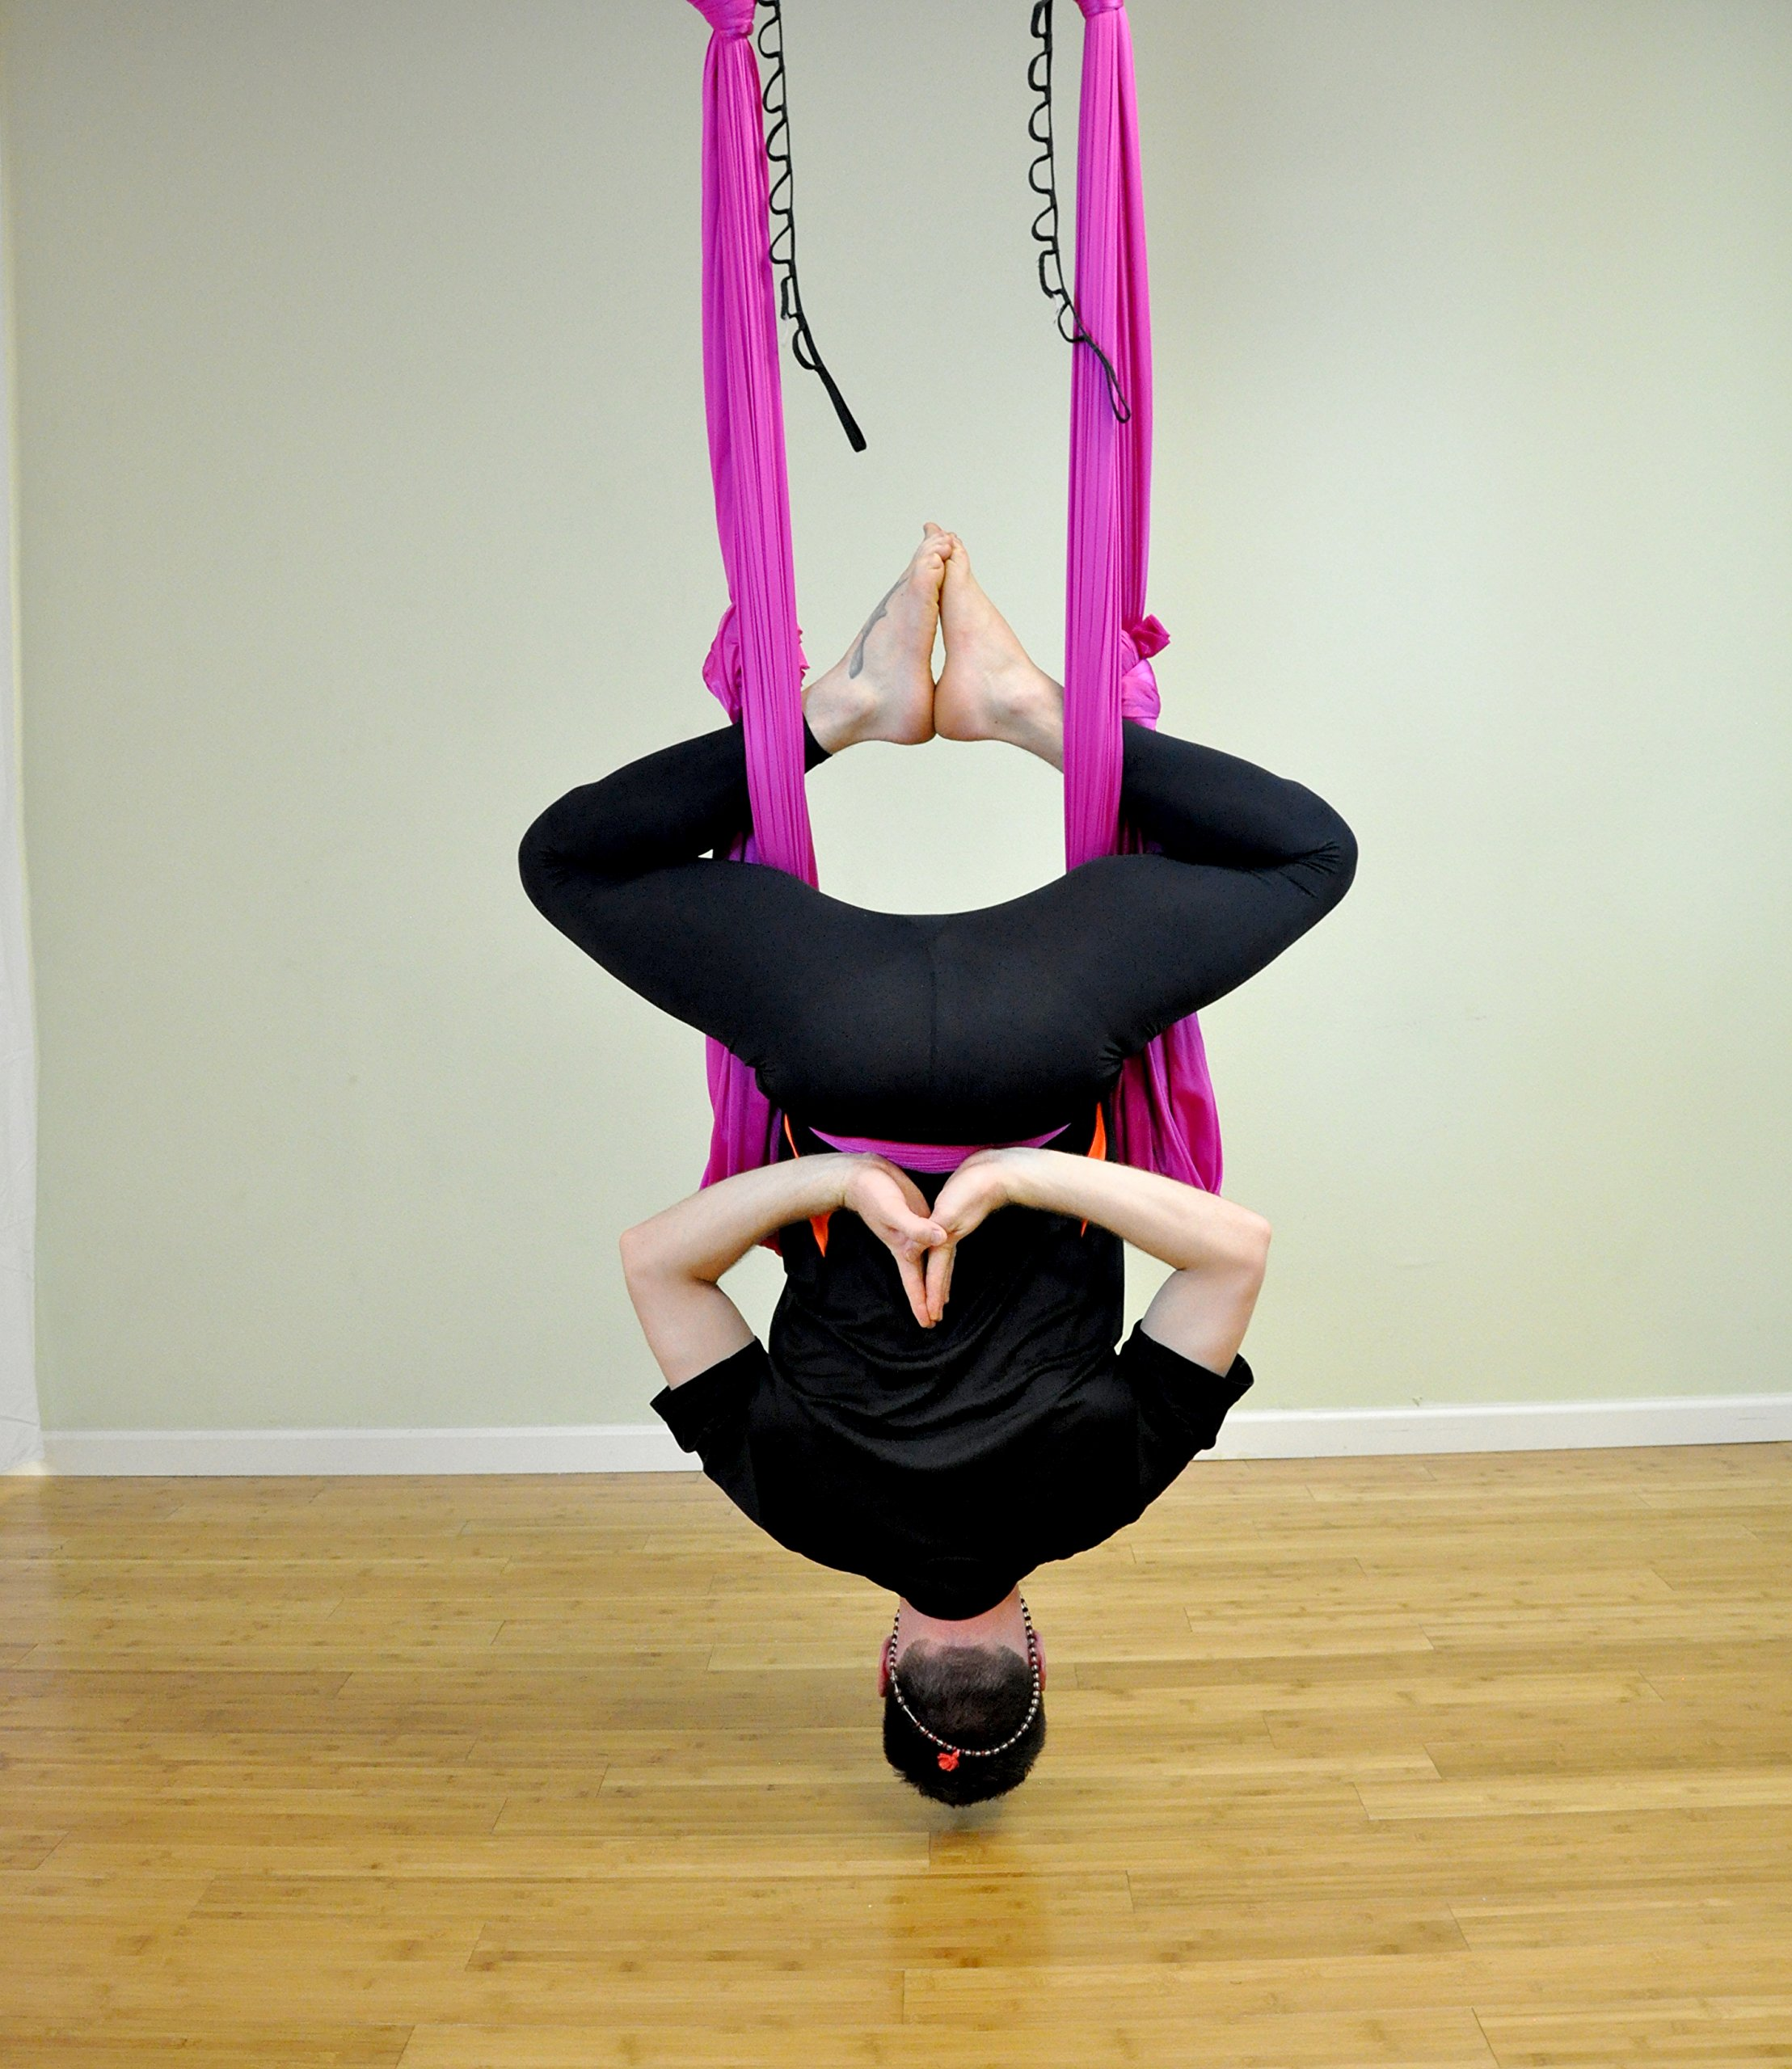 Deluxe Aerial Yoga Hammock (Yoga Swing for Trx, Aerial Yoga, Antigravity) (Fuscia Fizz)